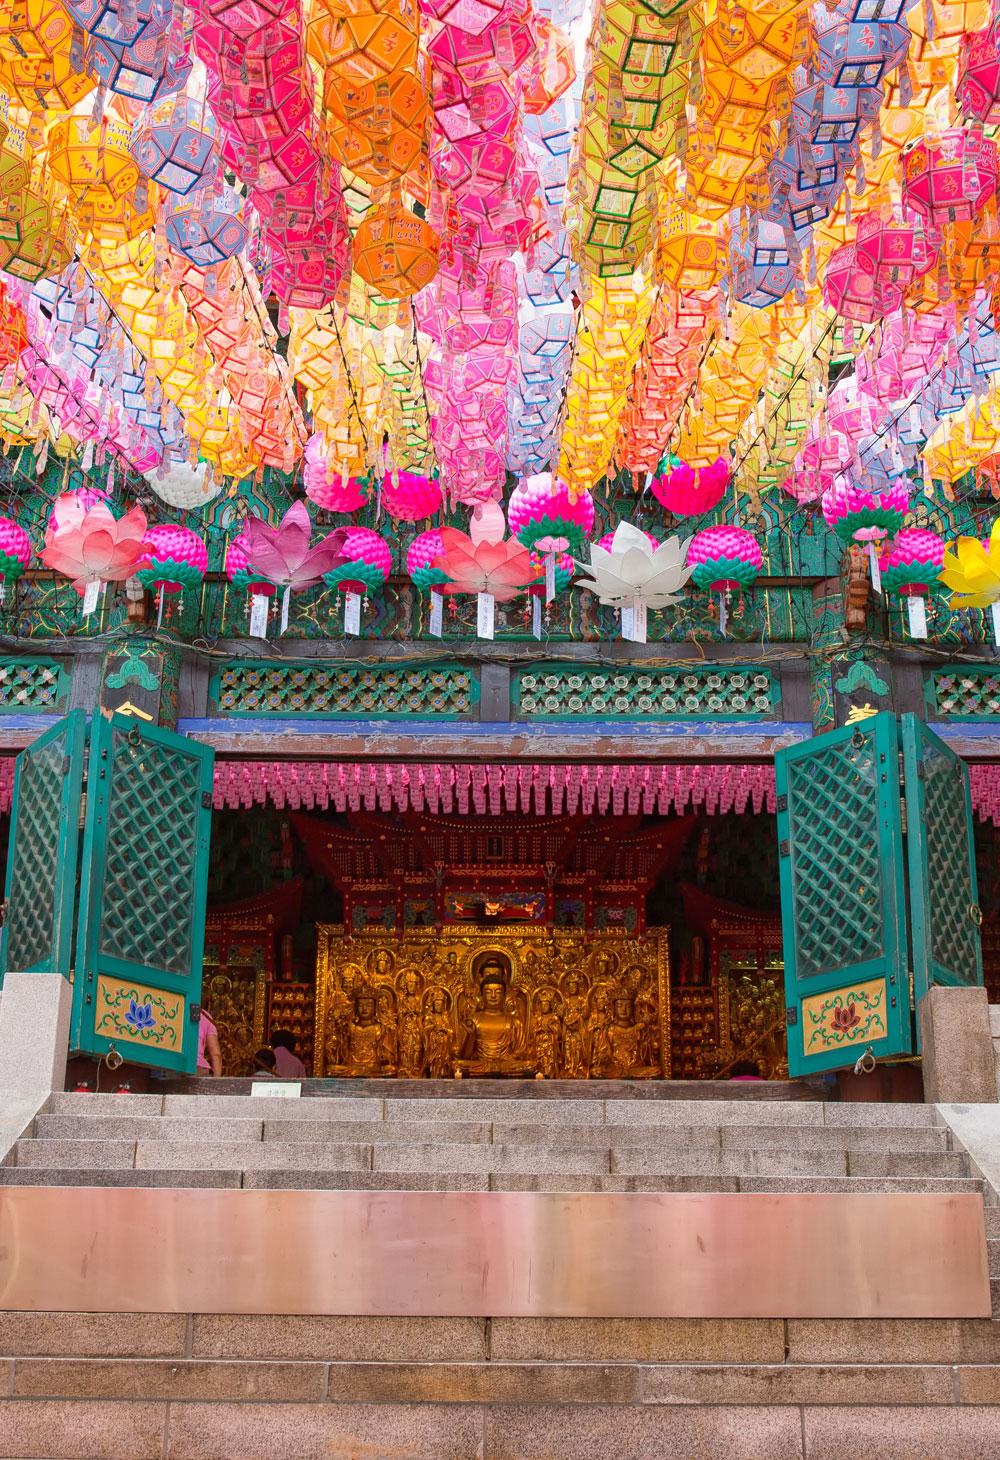 Bright, colorful lotus lanterns at Dosunsa temple in Bukhansan, Seoul, Korea